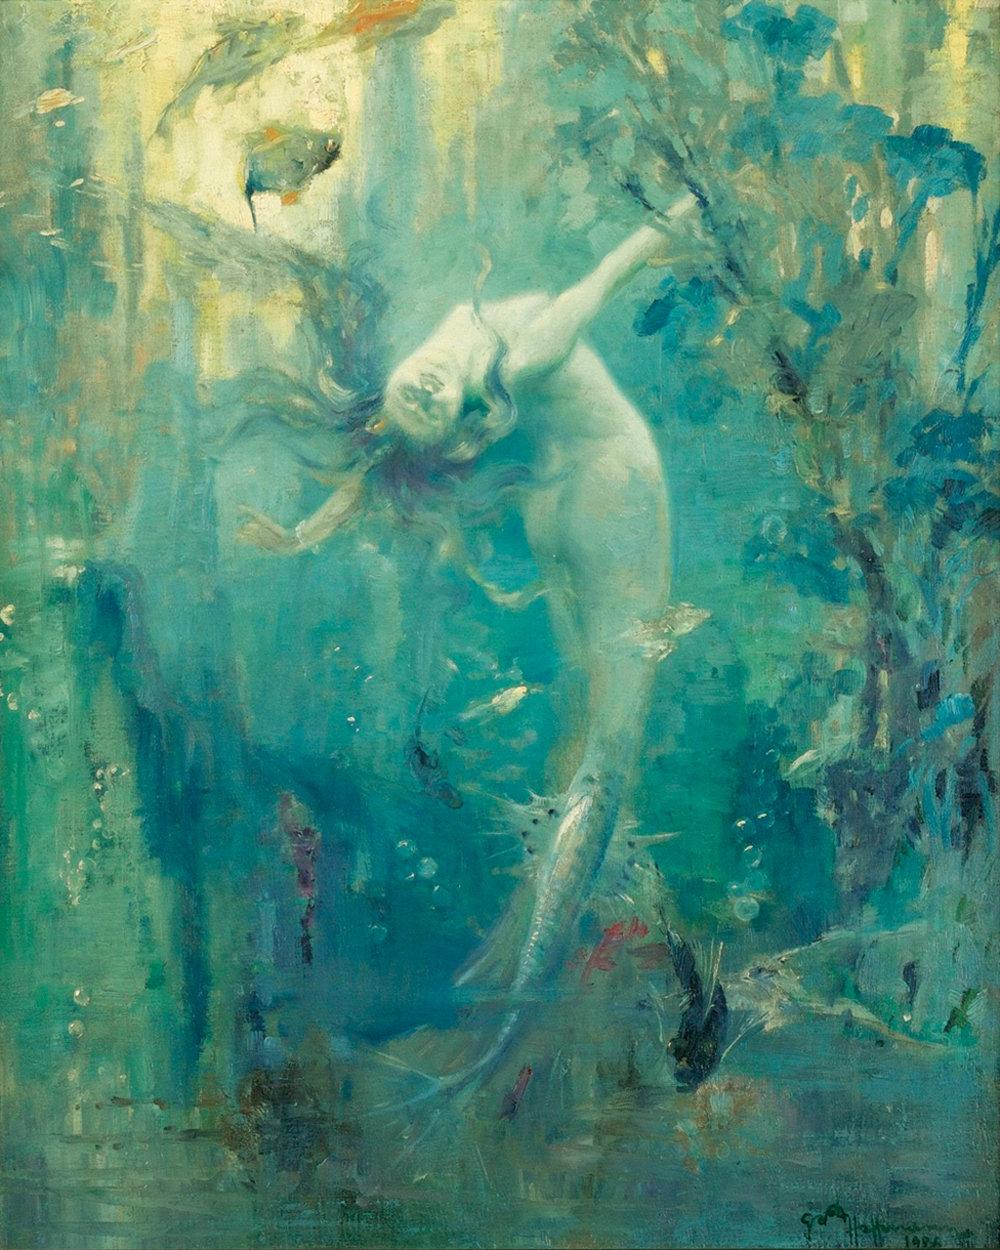 Gaston Hoffmann Sirene 1926